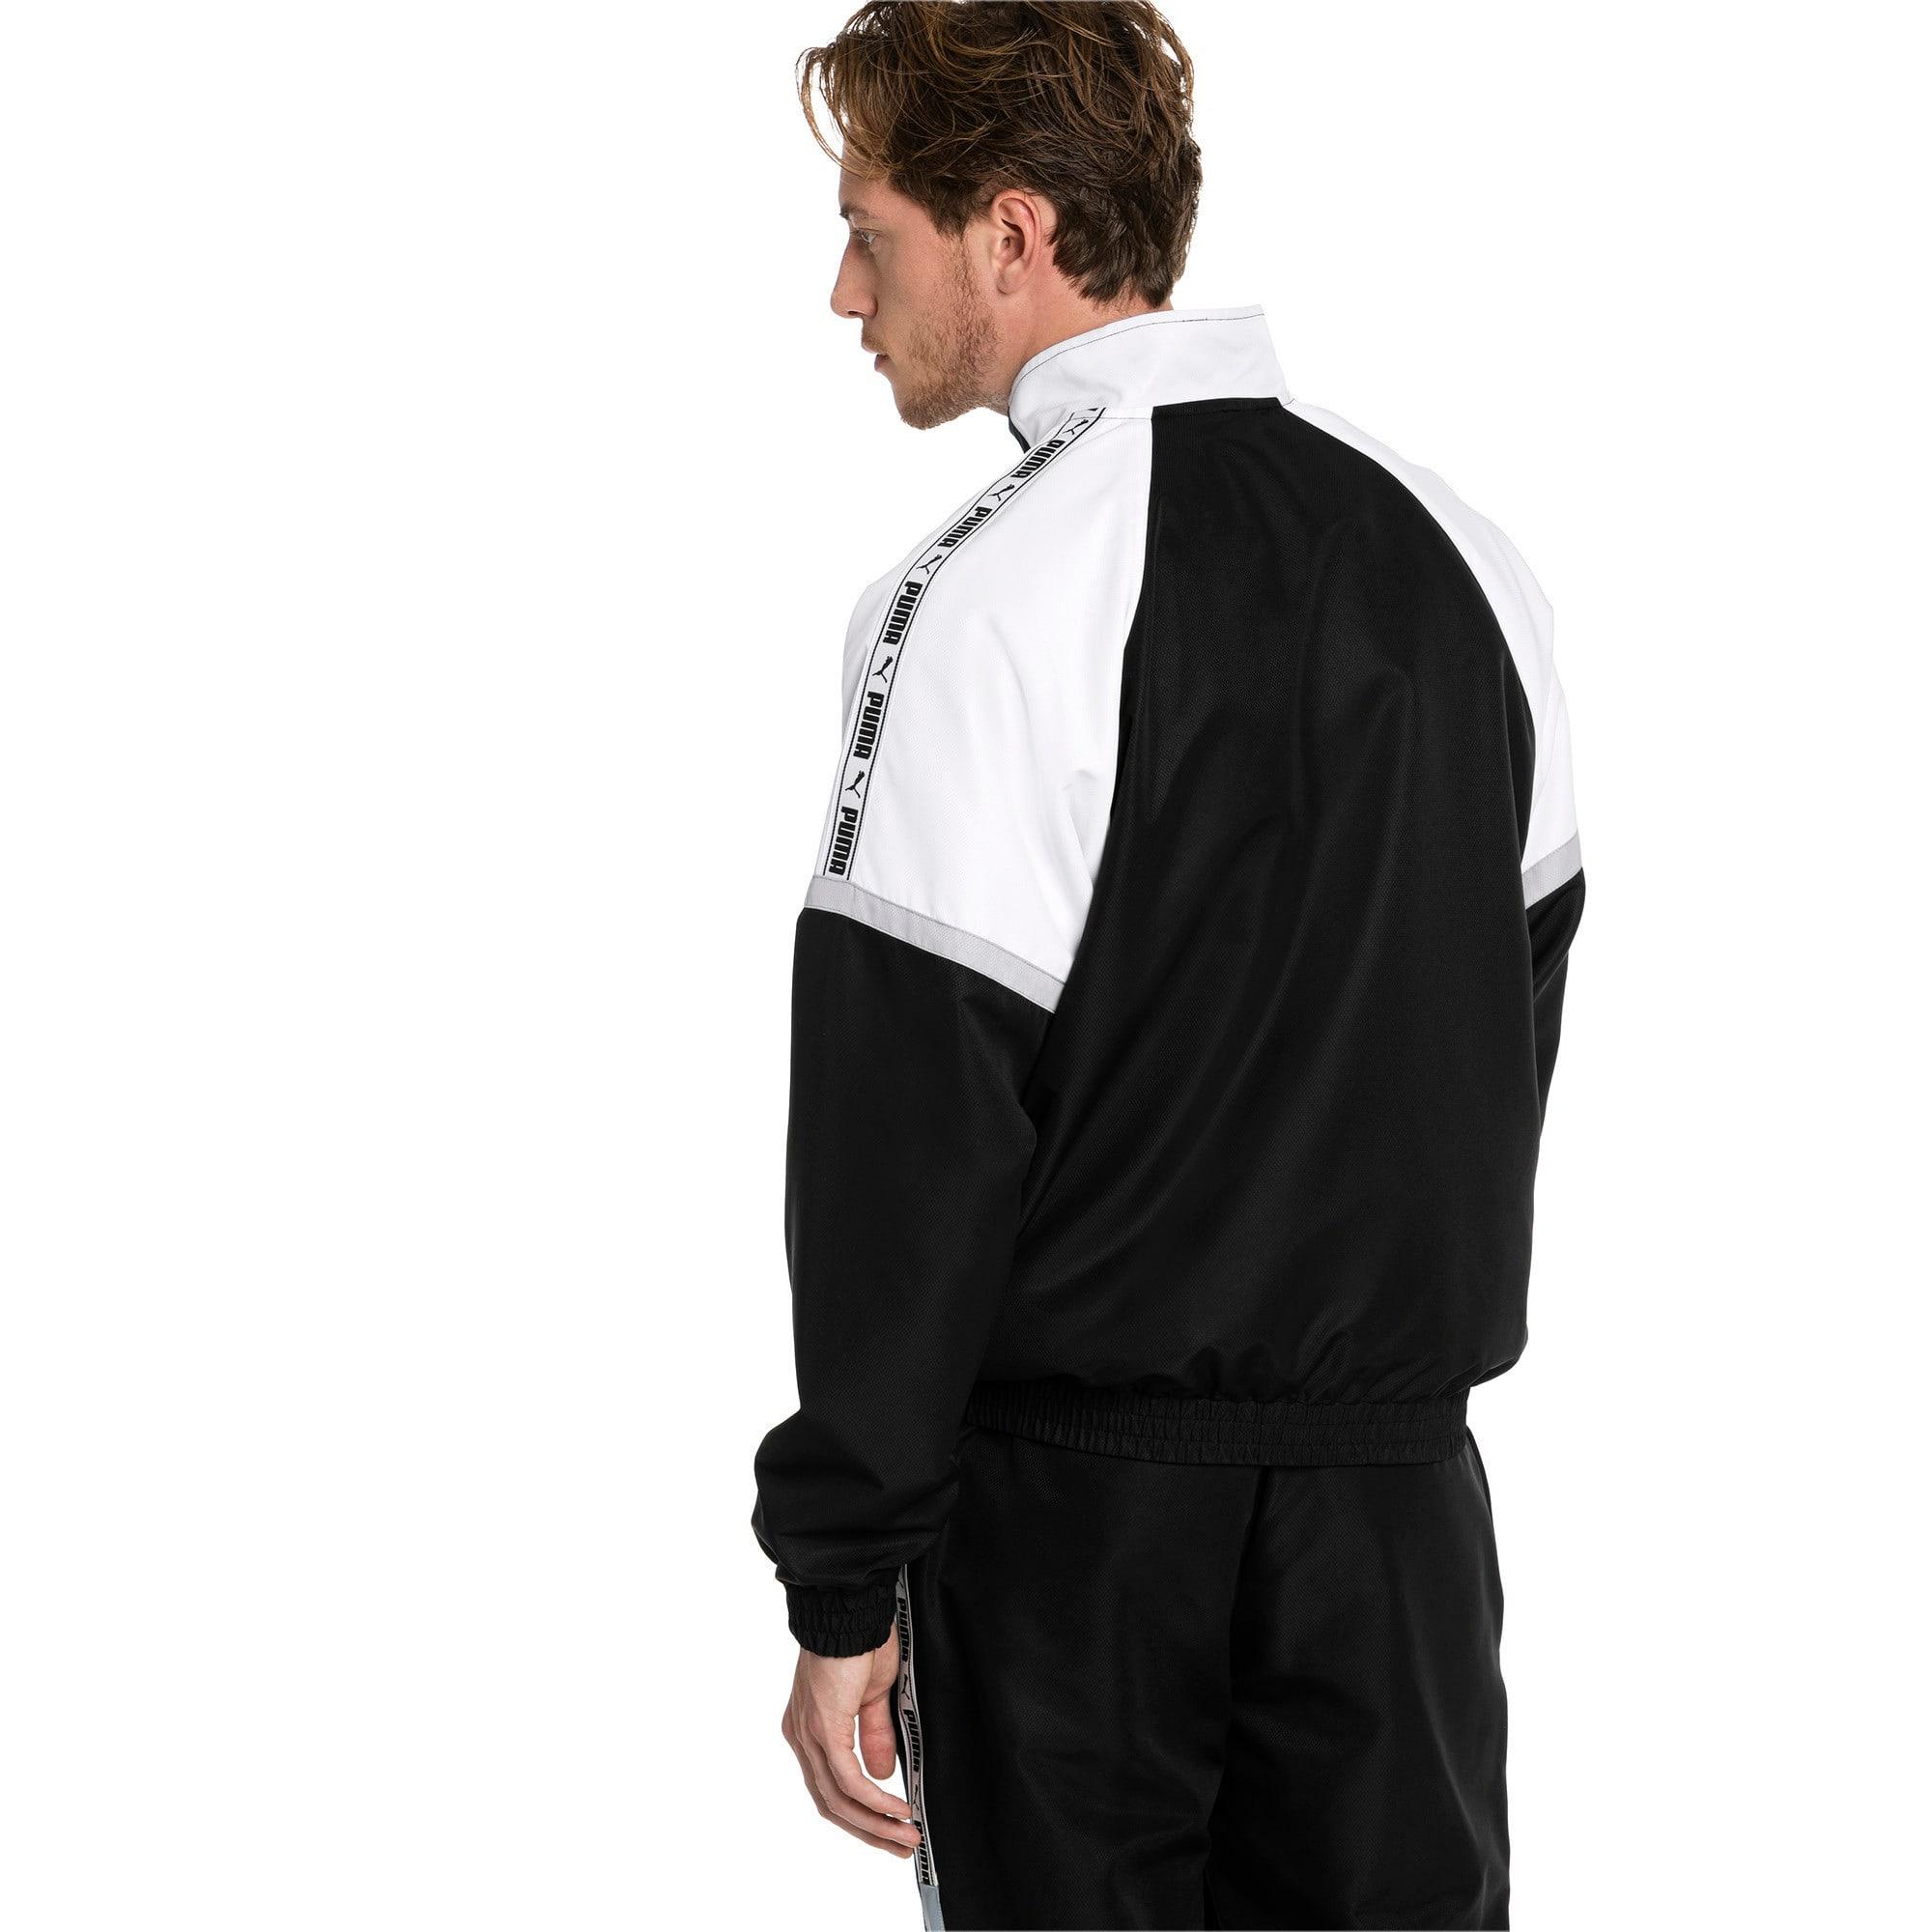 Thumbnail 2 of PUMA XTG Full Zip Men's Woven Jacket, Puma Black-Puma white, medium